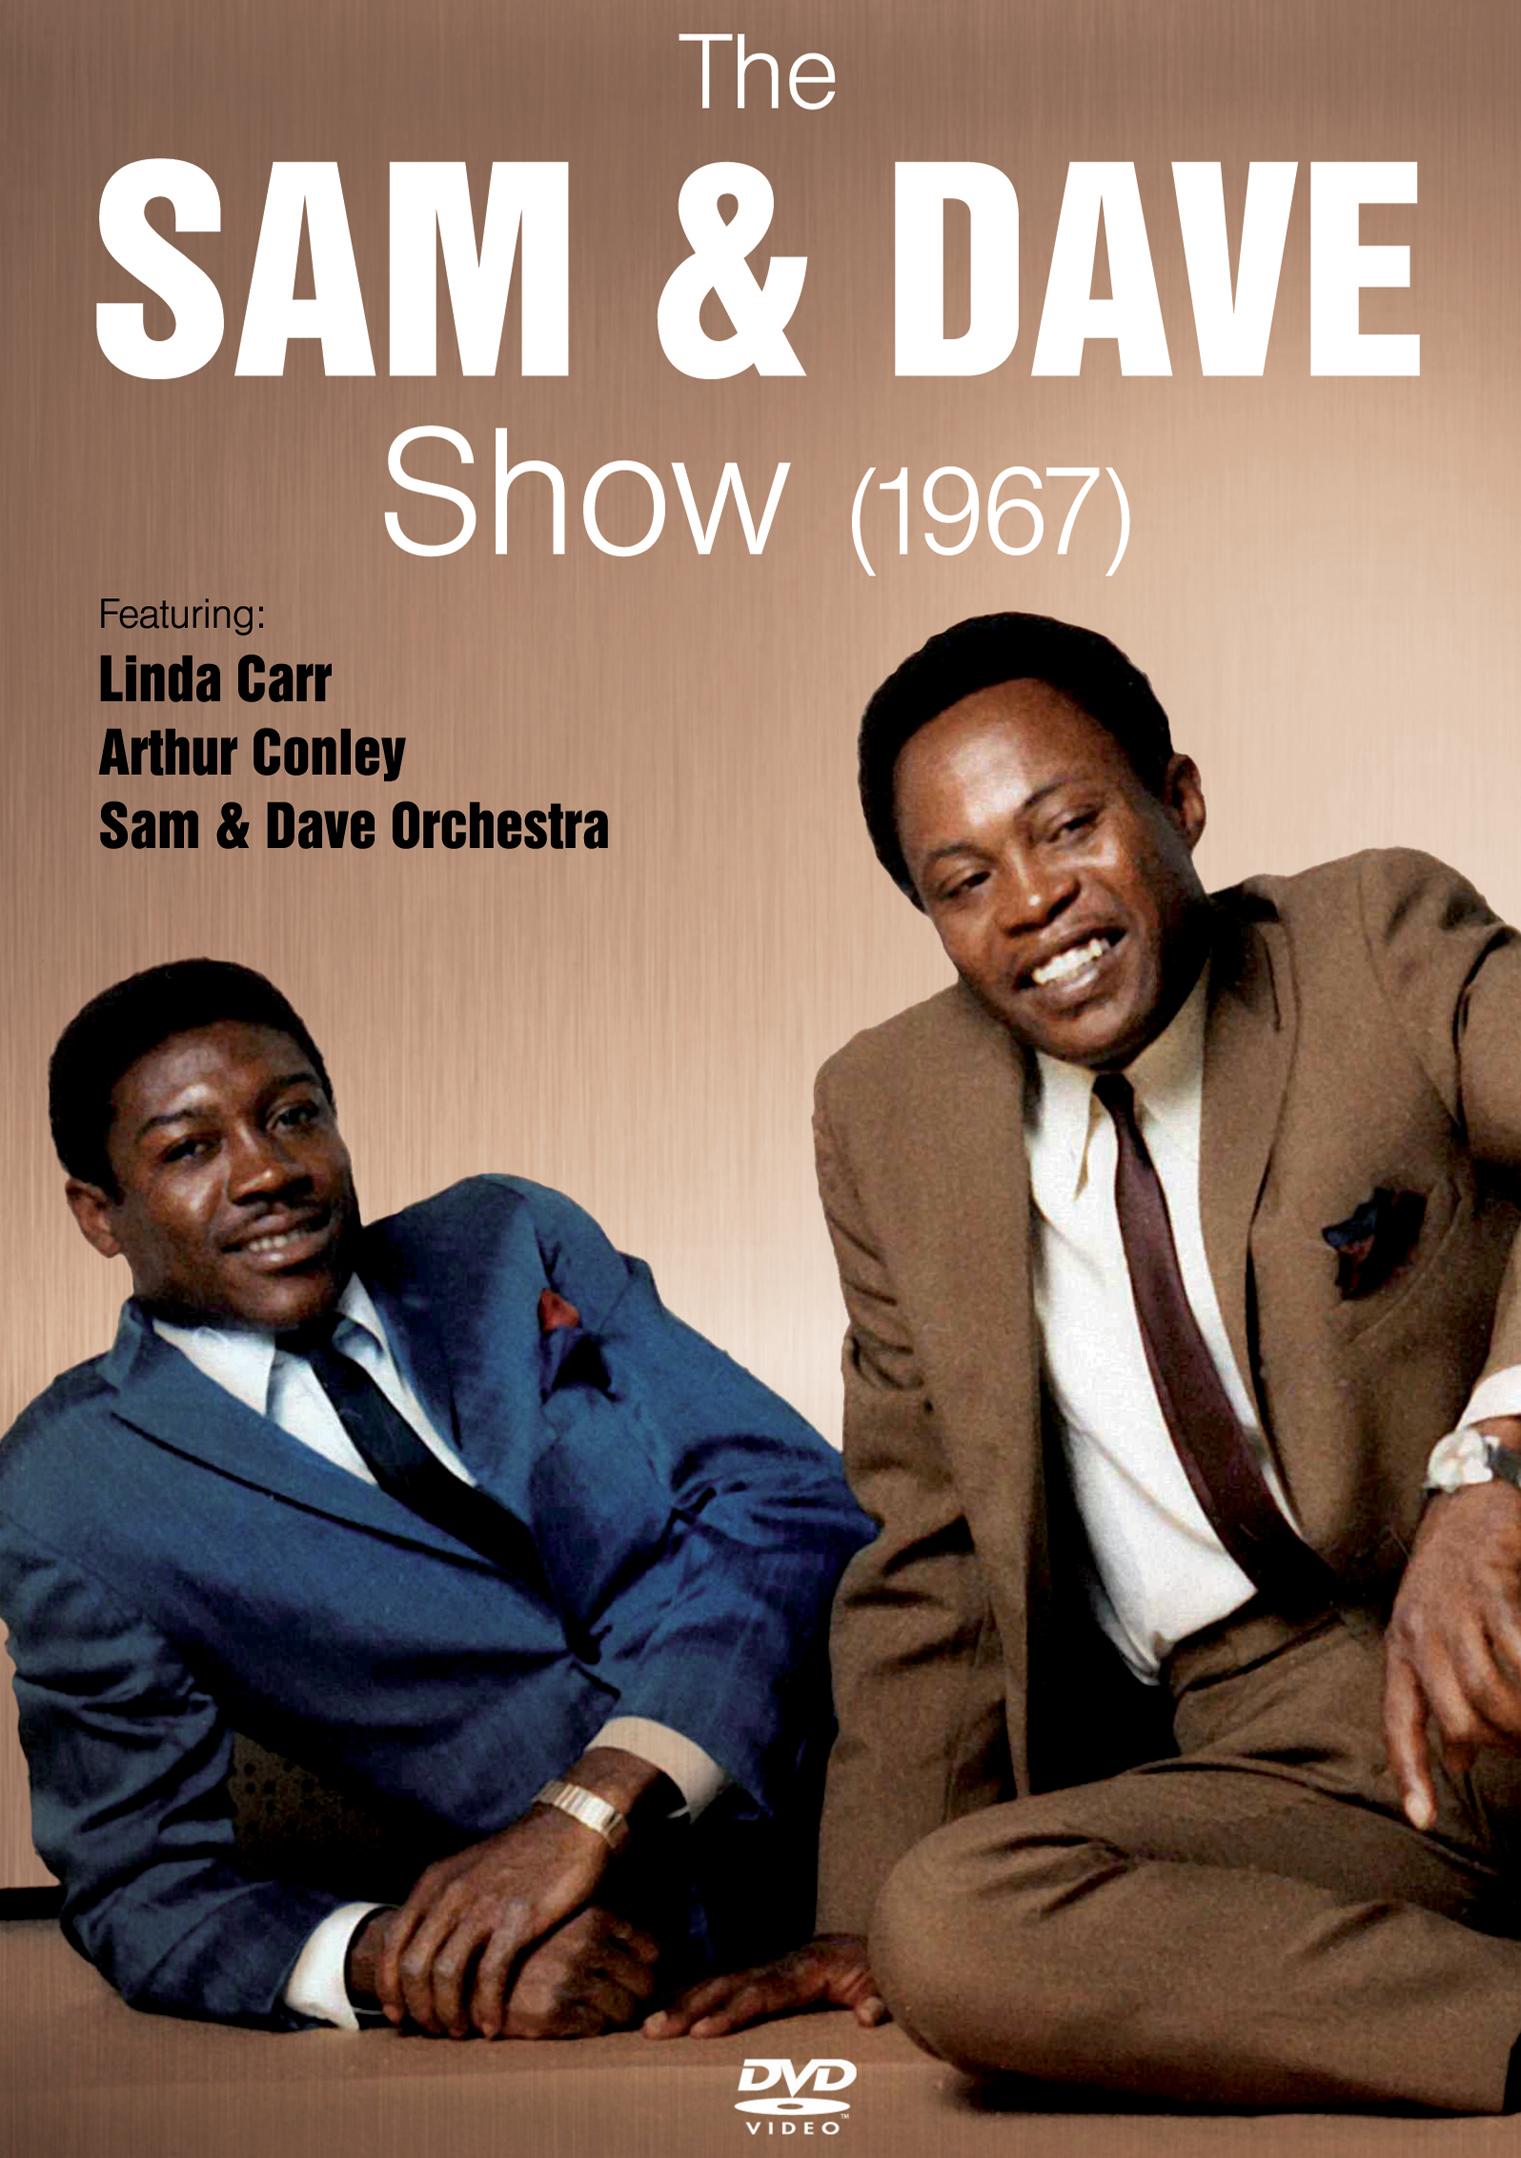 The Sam & Dave Show (1967) (1967)